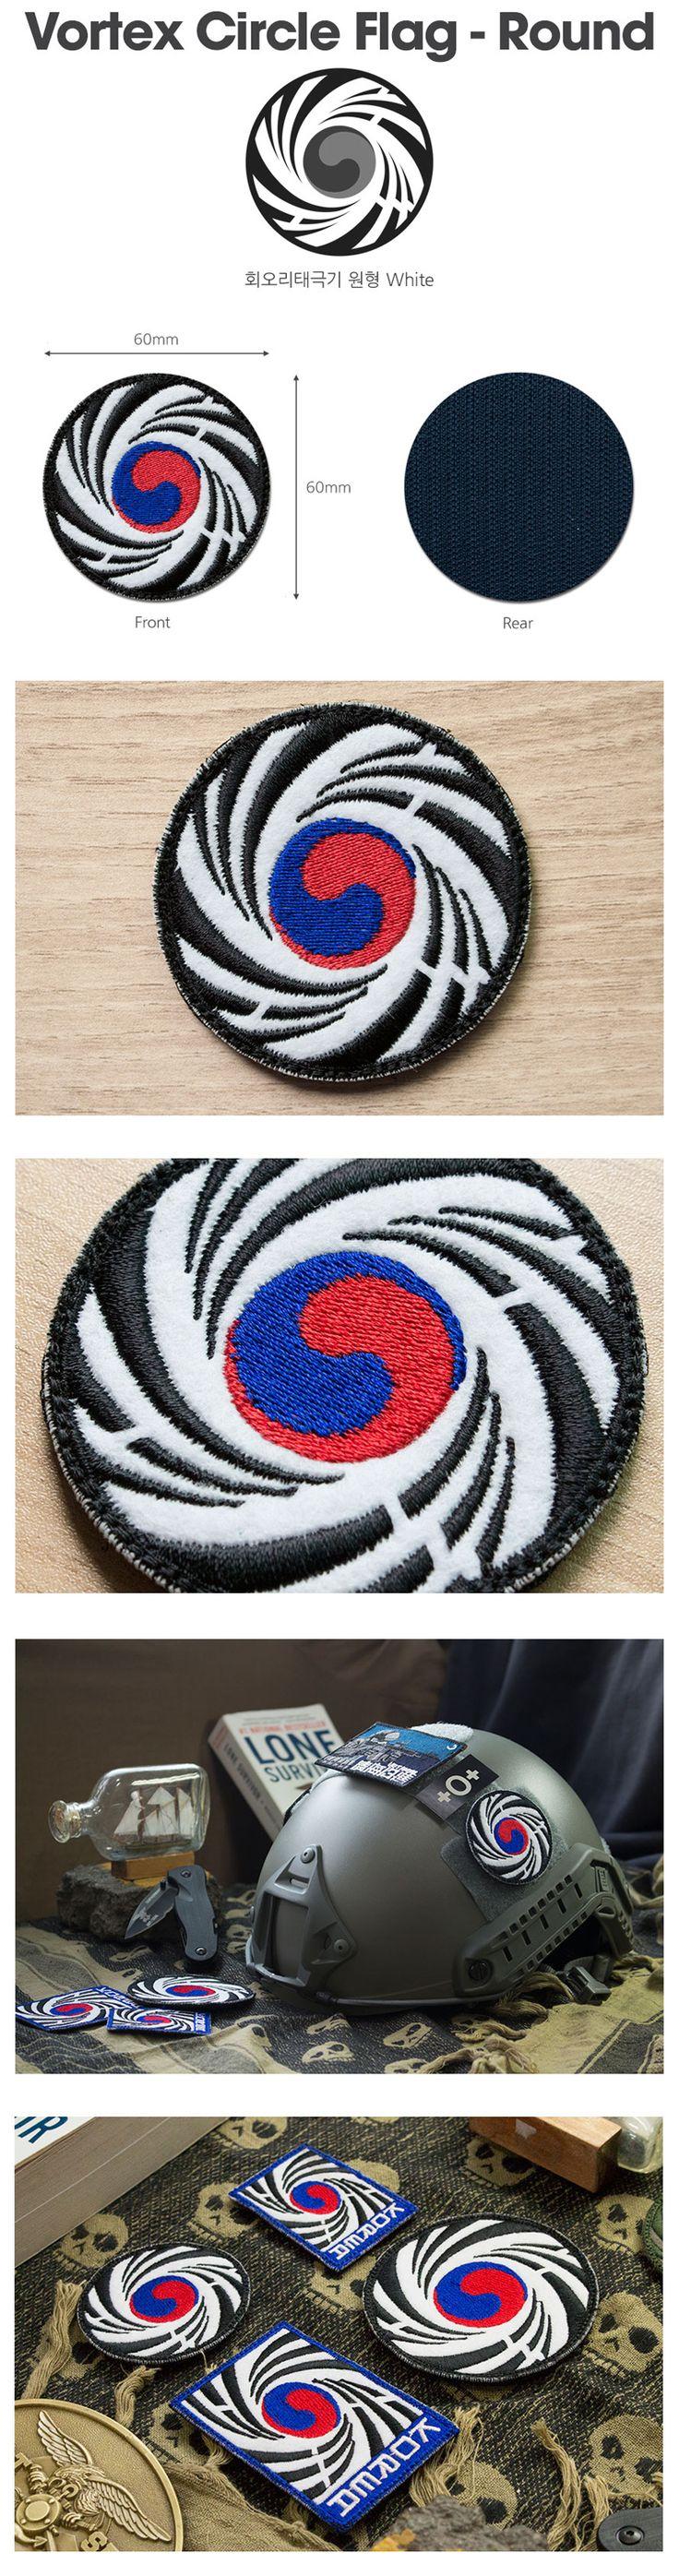 [Iron Romeo] Vortex Circle Korea Flag Patch (Color) - 아이언 로미오 회오리 태극기 패치 (컬러/원형) : 8,000원 : (컬러/원형) 태극기 패치 - NetPX